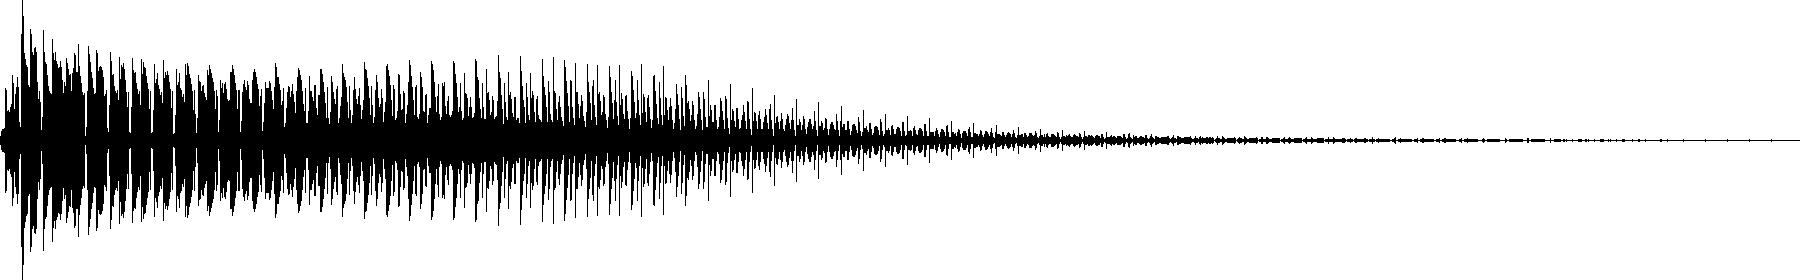 tx81z fm crash